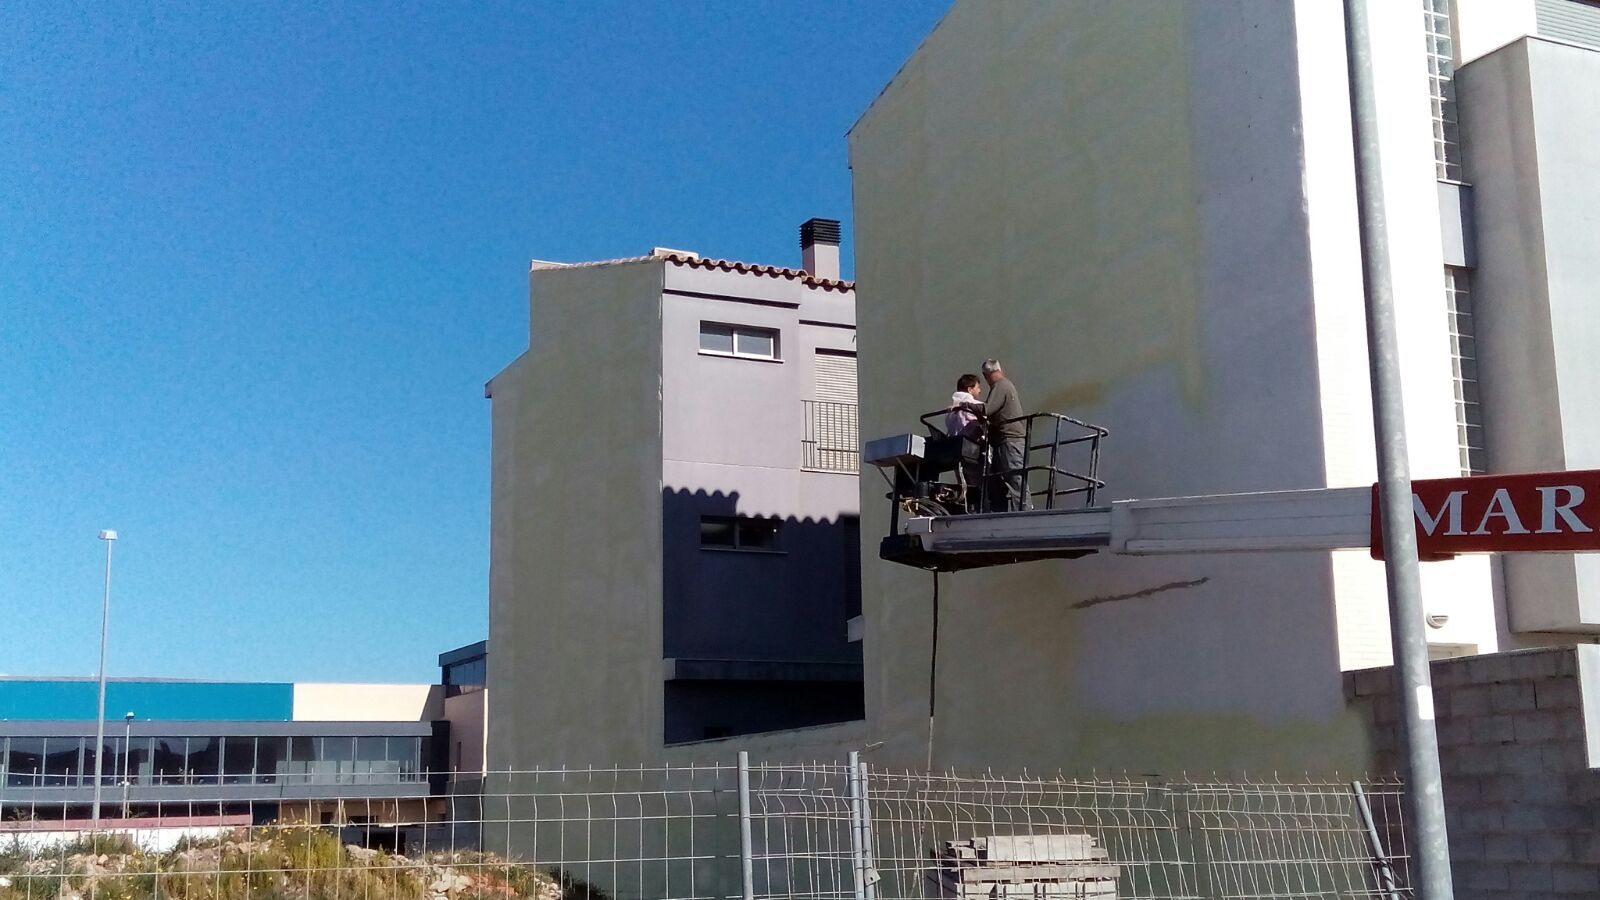 Aislamiento de fachadas con espuma de poliuretano